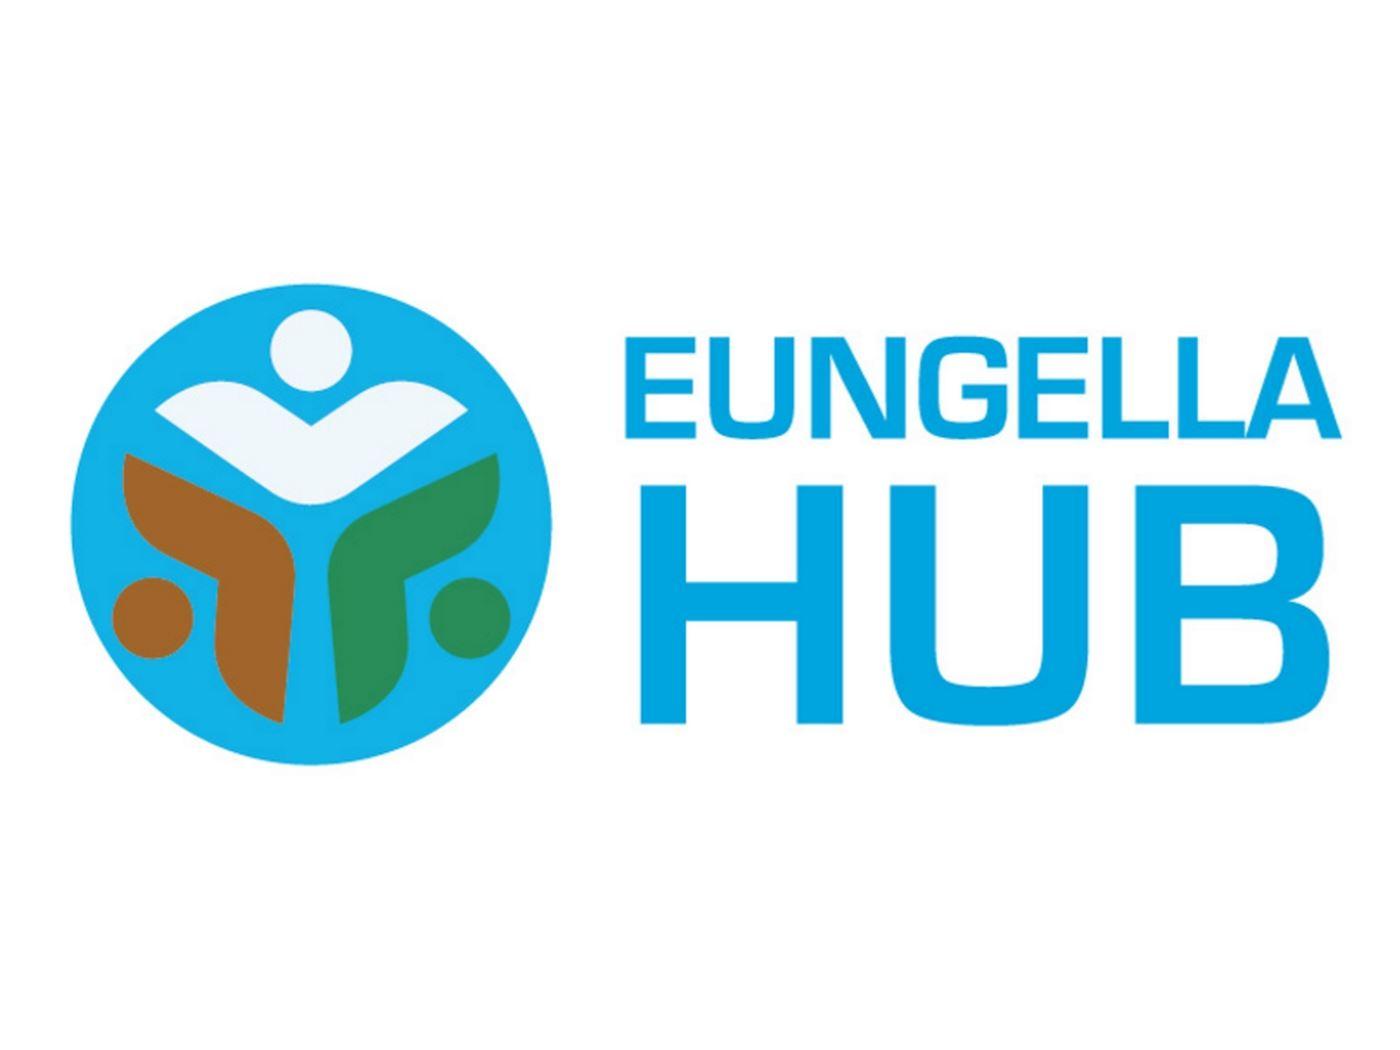 Eungella Community Development Association